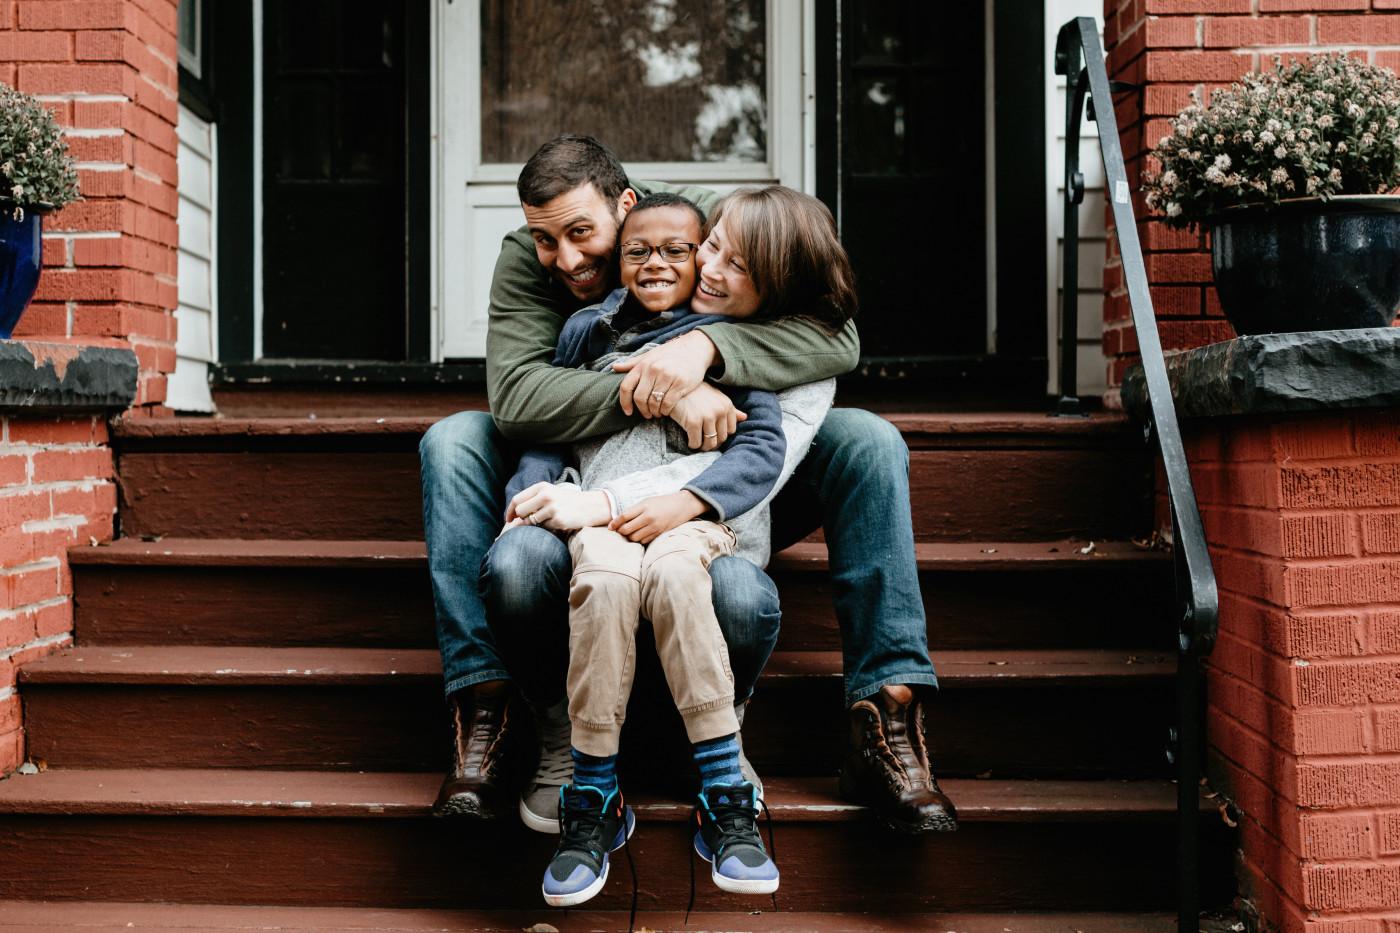 Snapshot Of An Adoptive Family